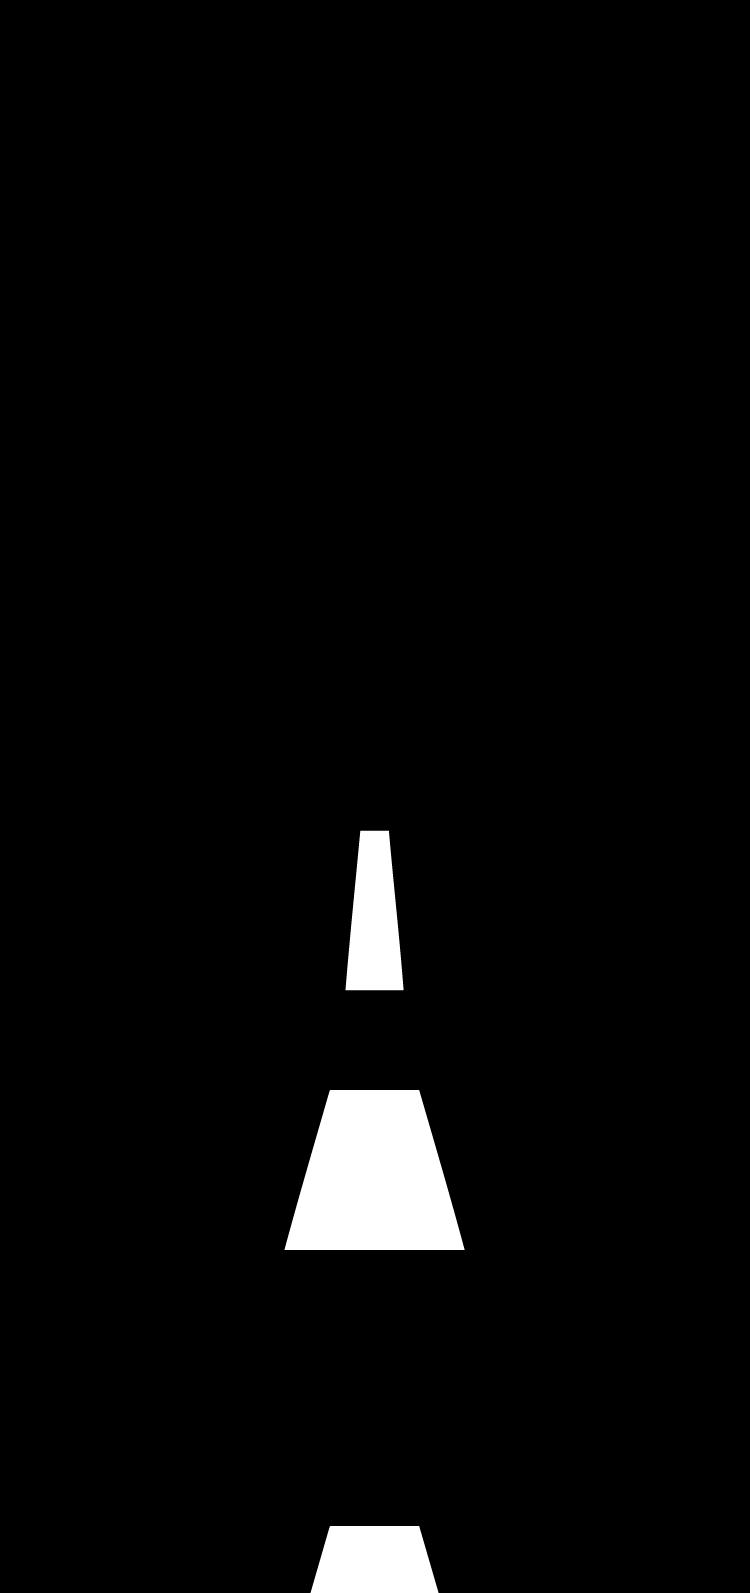 Eiffel Tower Outline Clip-art Eiffel Tower Outline